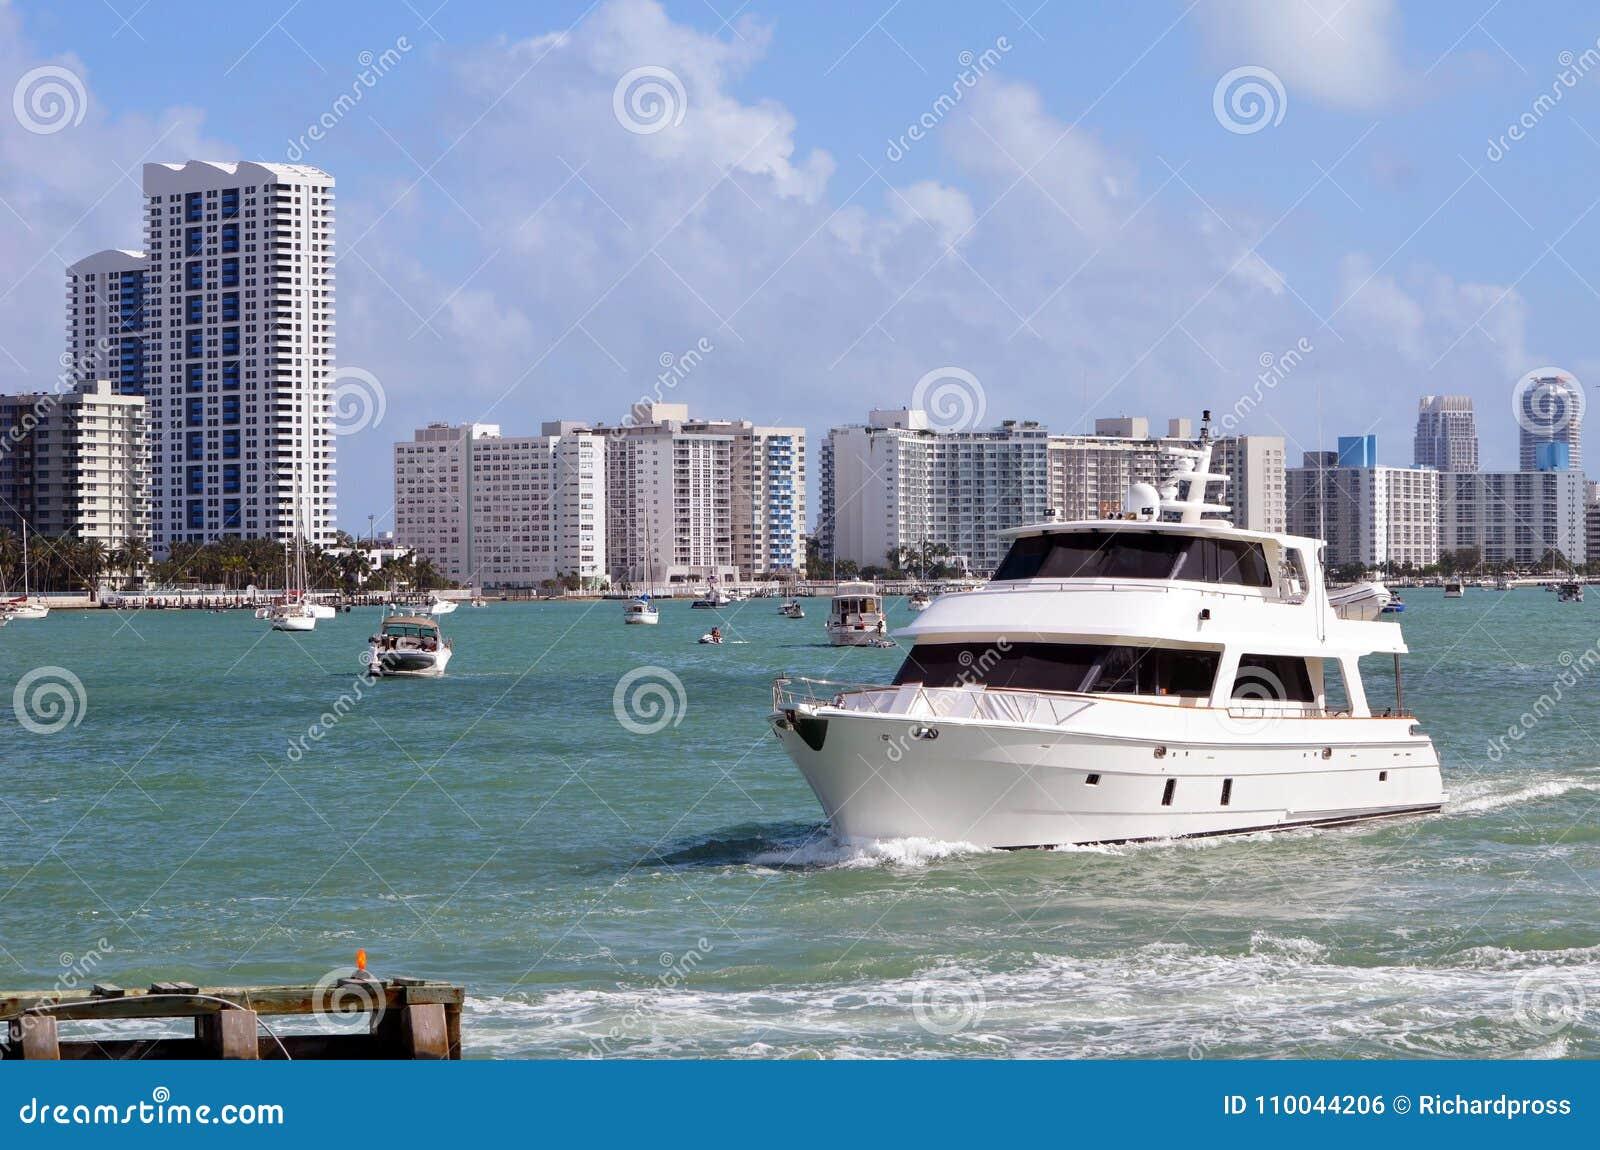 Vintage Yacht and SoBe Condo Skyline